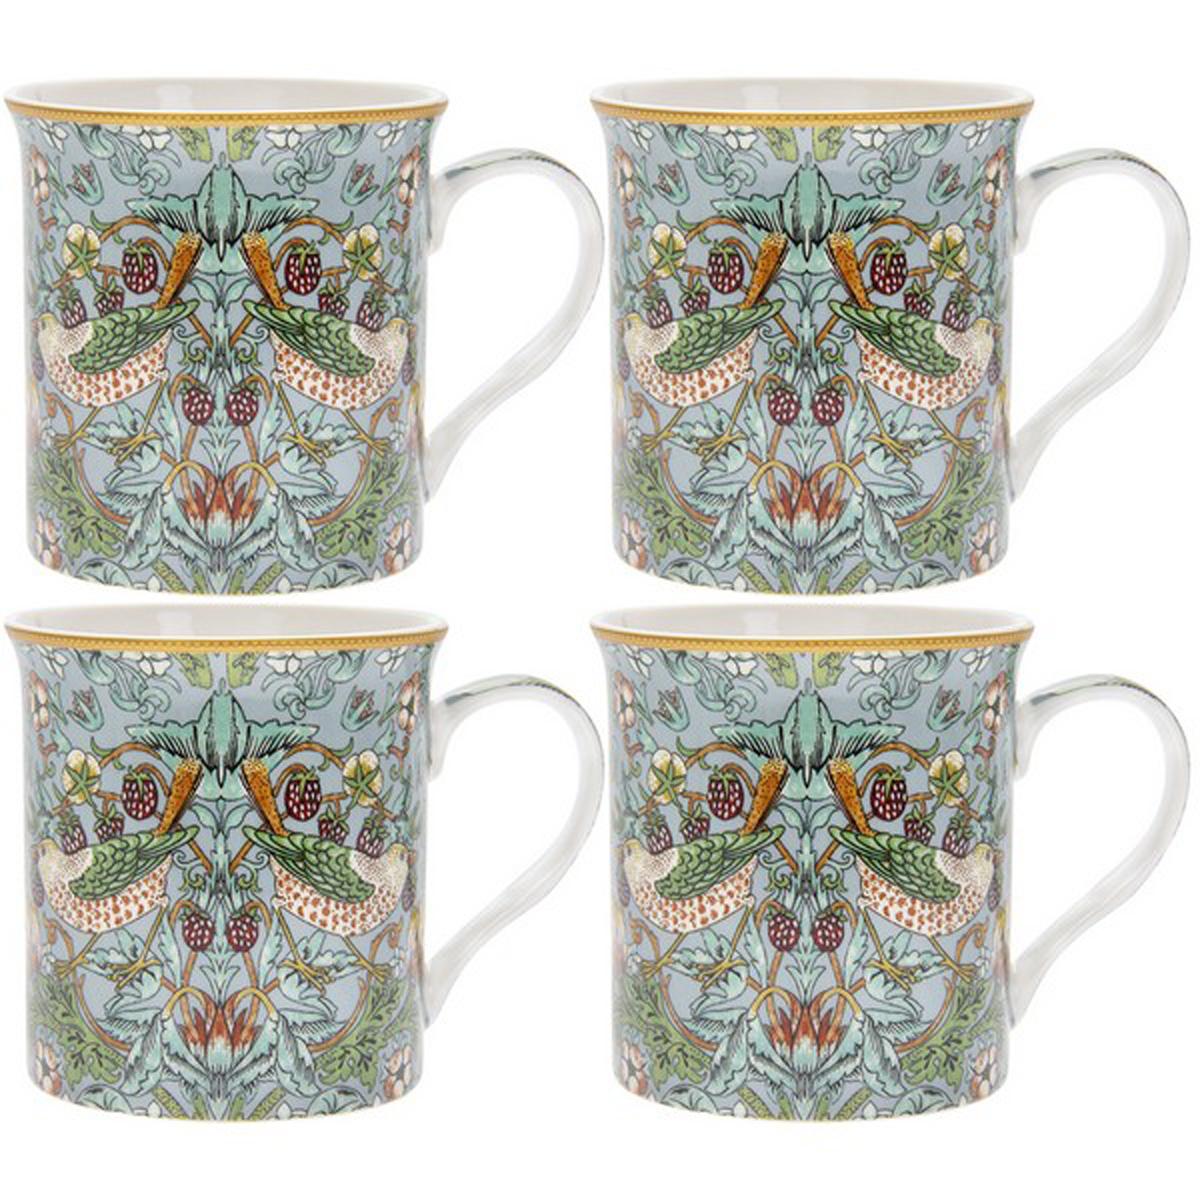 Coffret mugs porcelaine \'William Morris Collection\' vert - Strawberry Thief (4 mugs) 85x85 mm - [R0604]